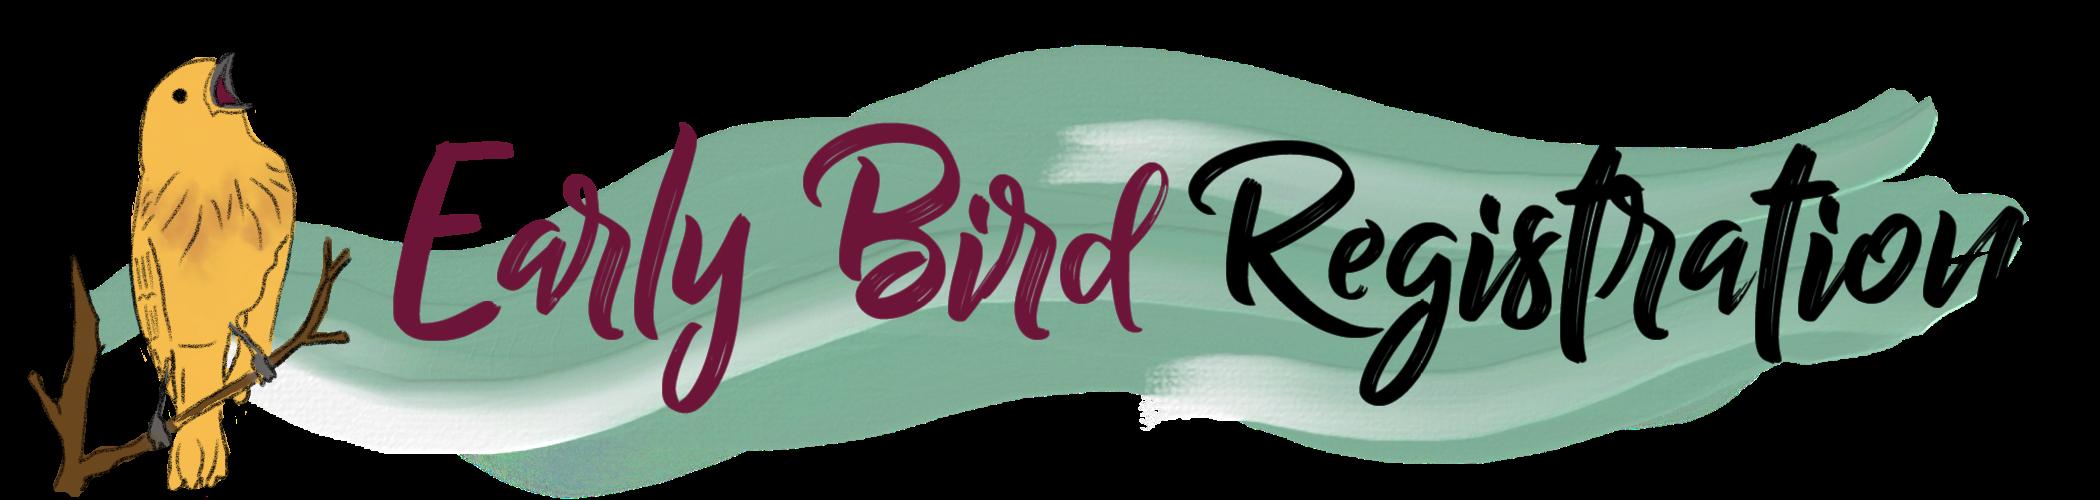 Early bird Registration Mentorship Circle